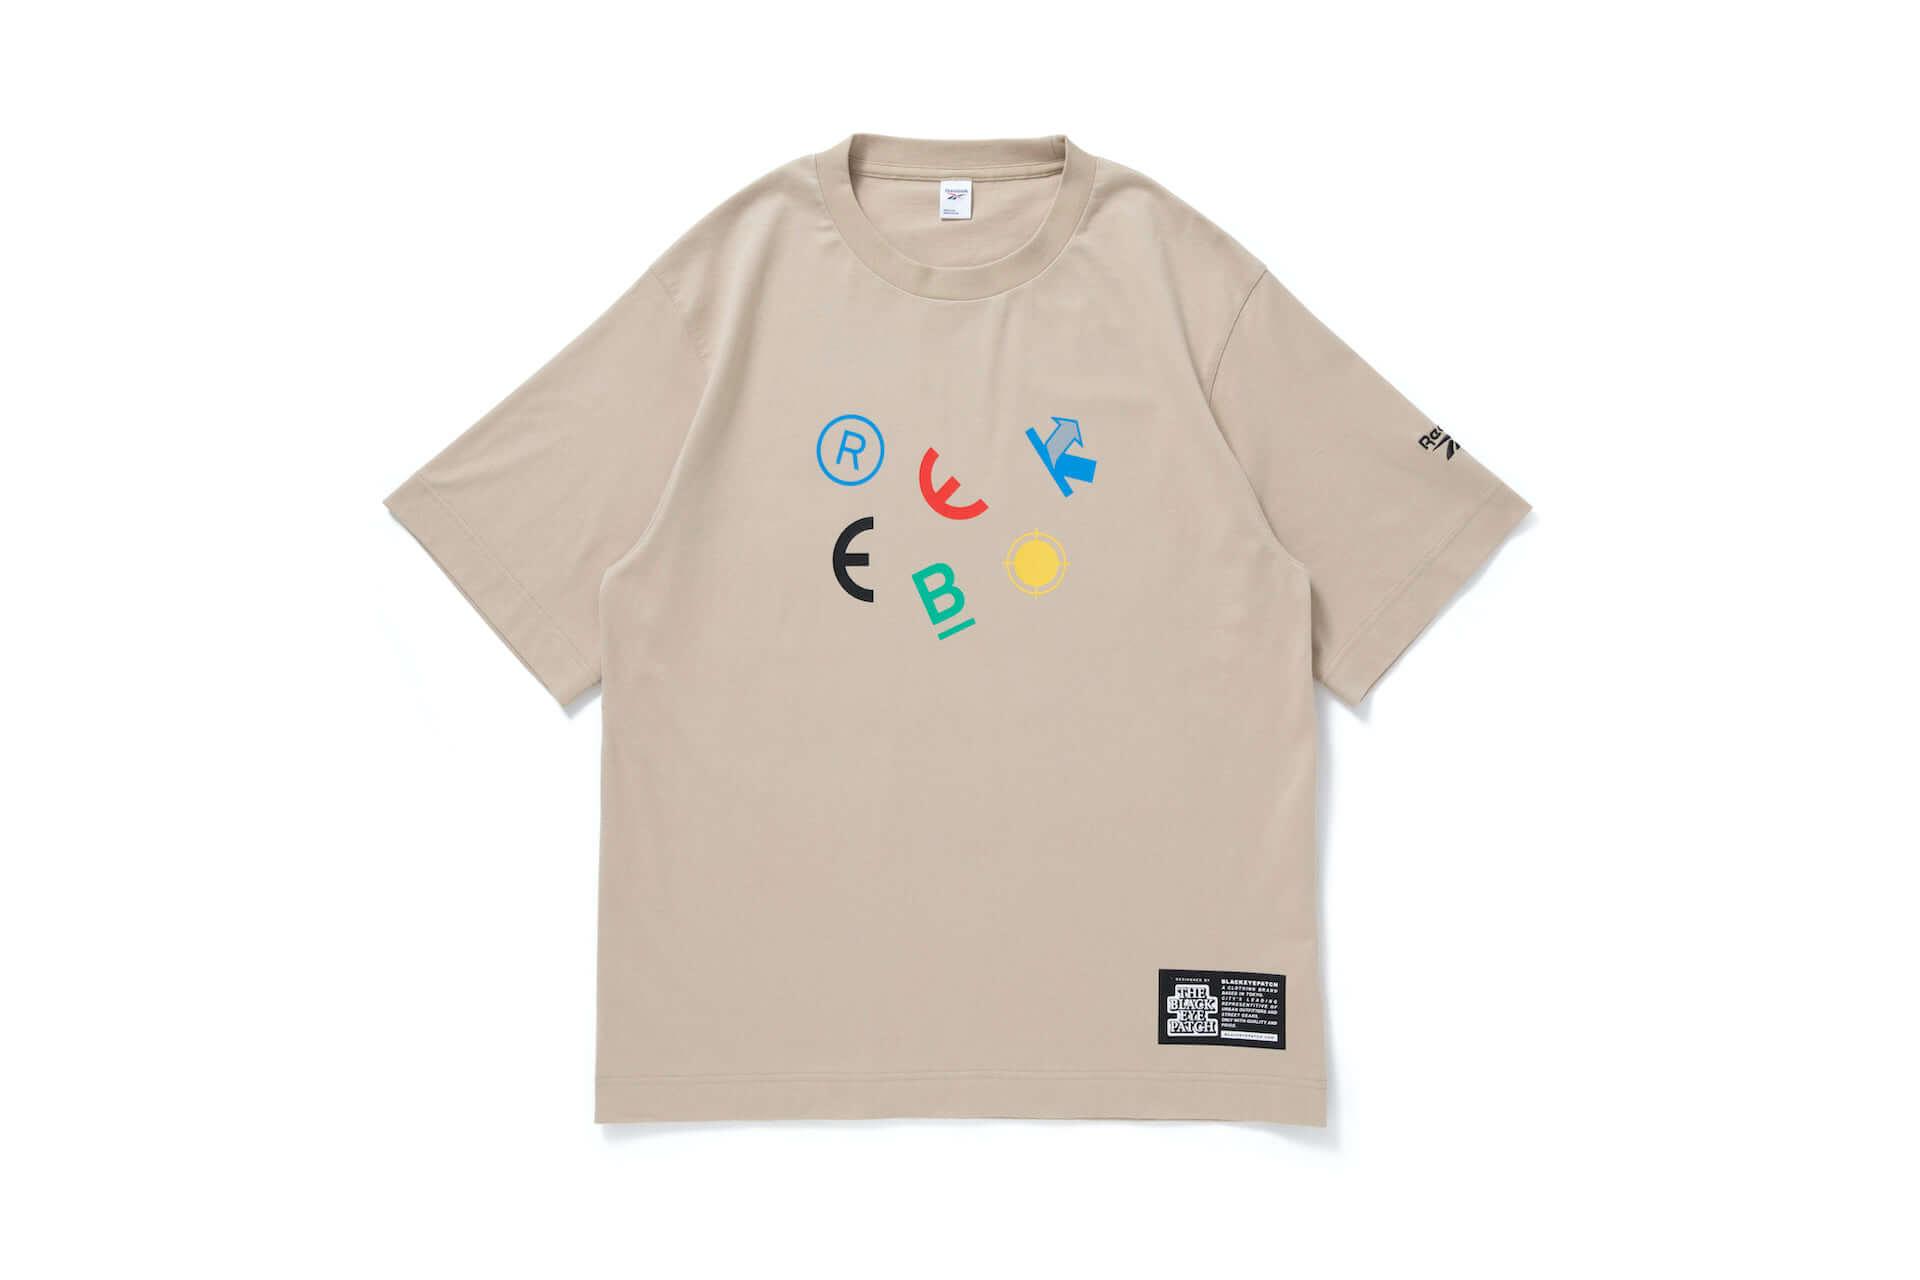 BlackEyePatchがReebokのデザインを再構築!「CLUB C BEP」やTシャツ含むフルコレクションが登場 lf200716_reebok_6-1920x1280